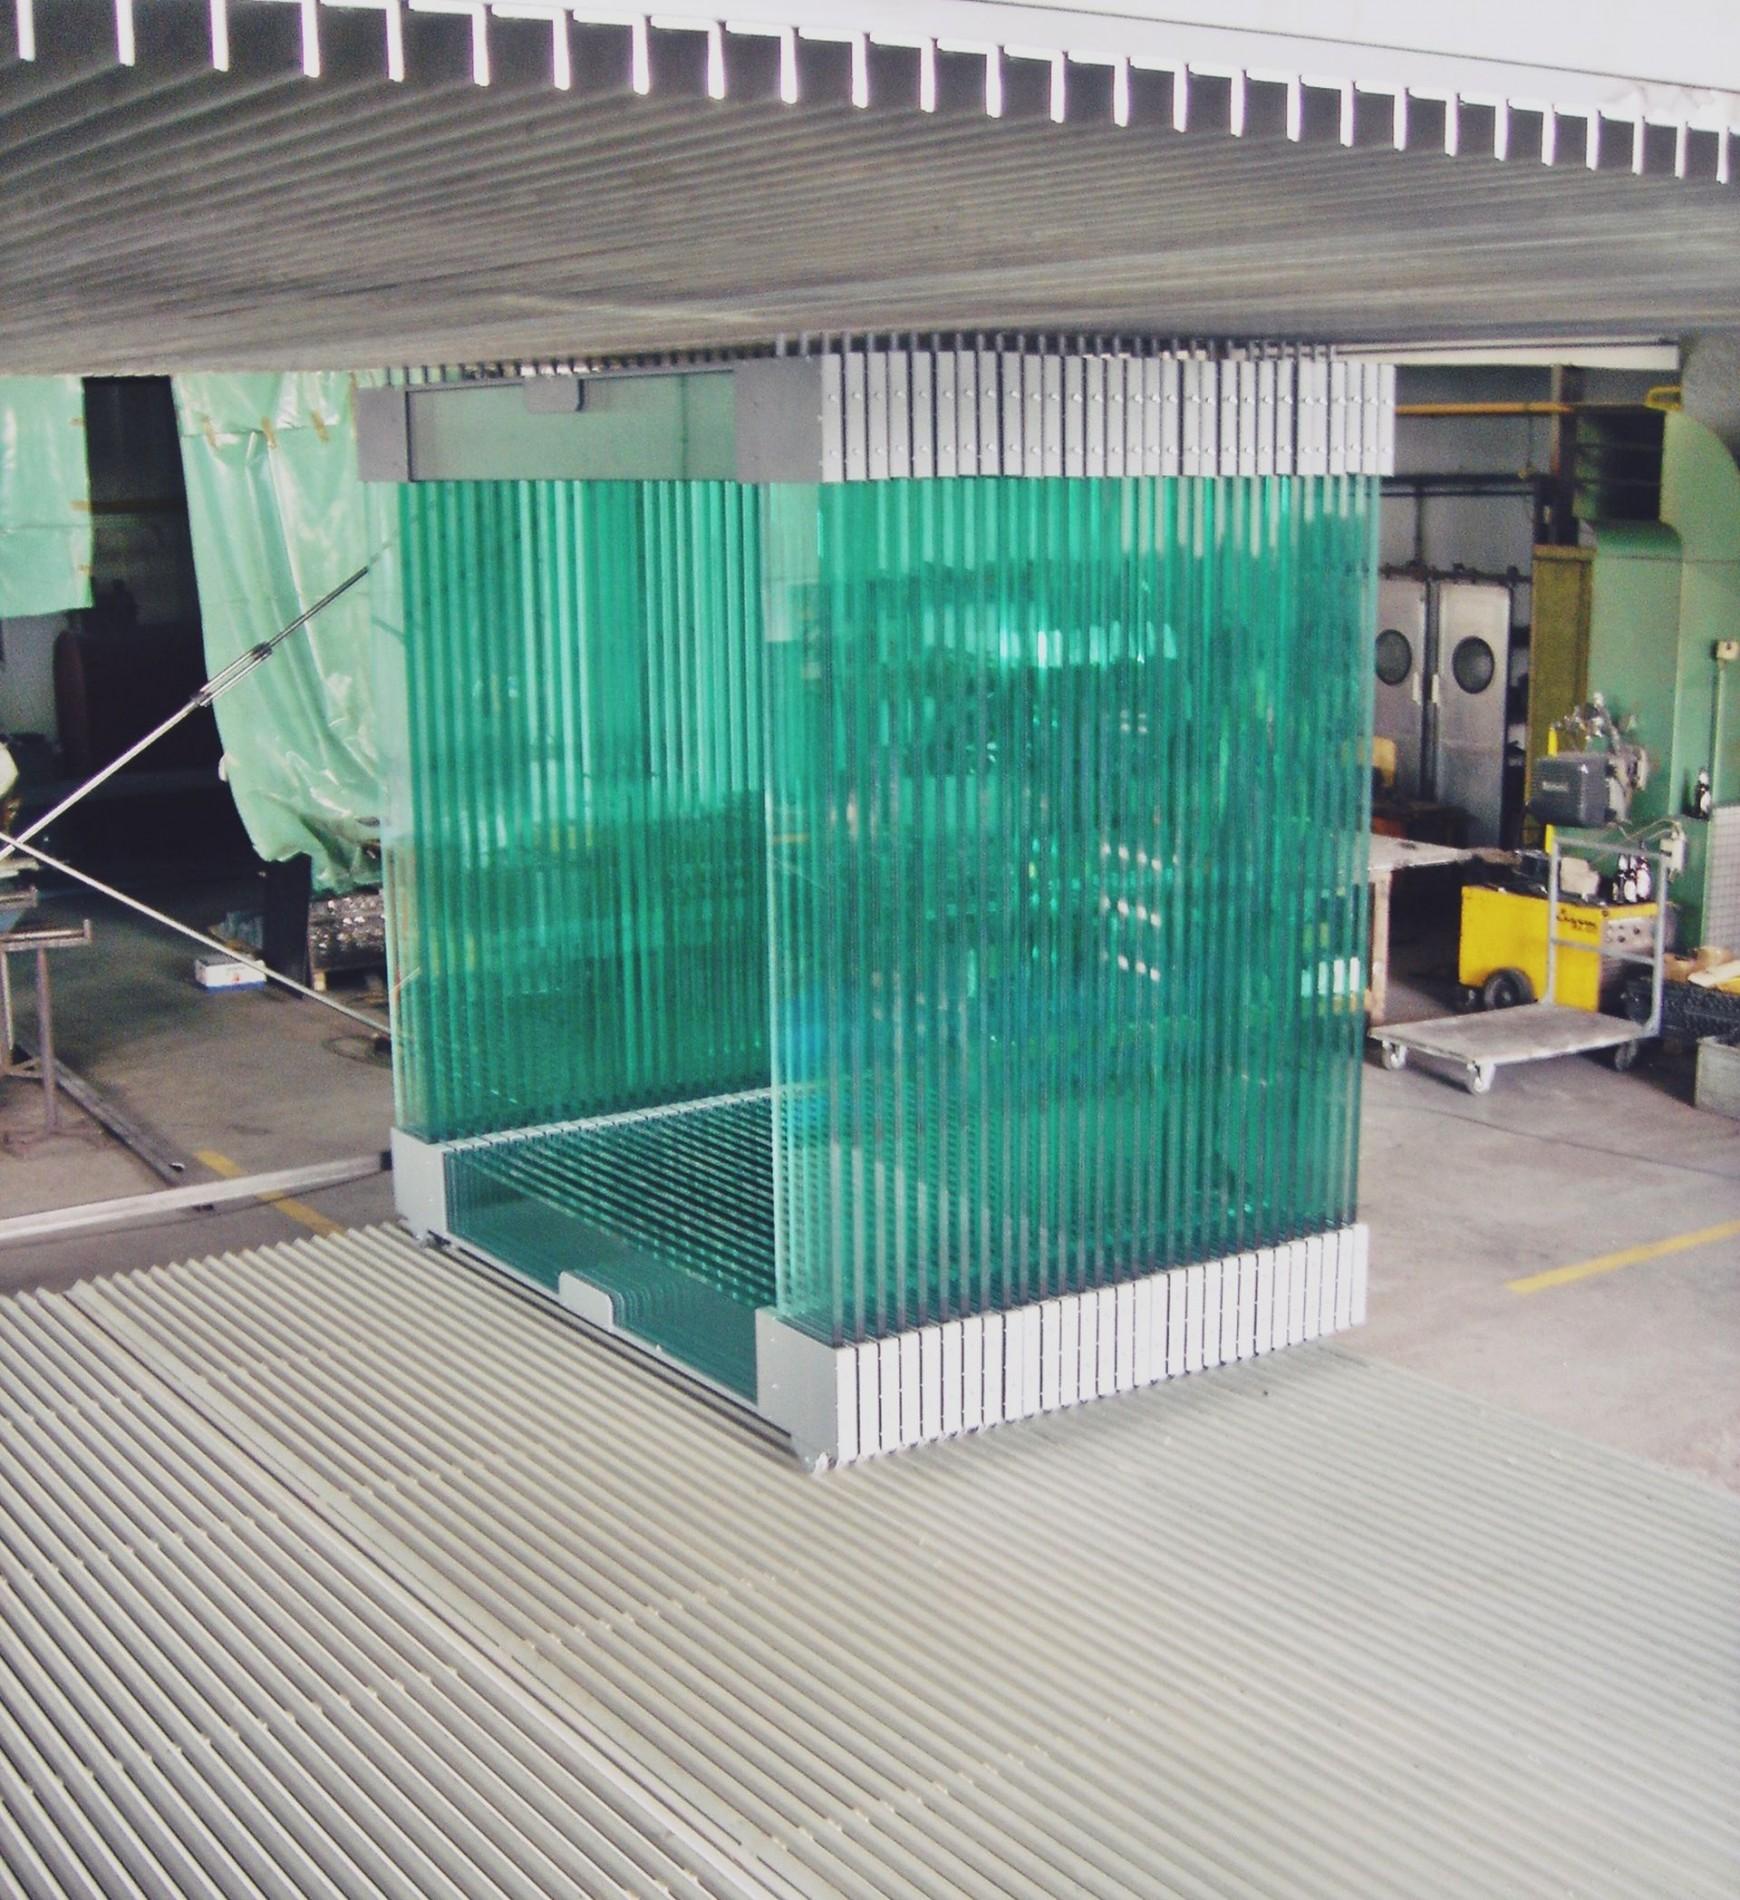 venice architecture biennale, venecijanski arhitektonski bijenale, 2004, frameworks, croatia, hrvatska, steel, čelik, venice bienalle 2004, construction, upi-2m, upi2m